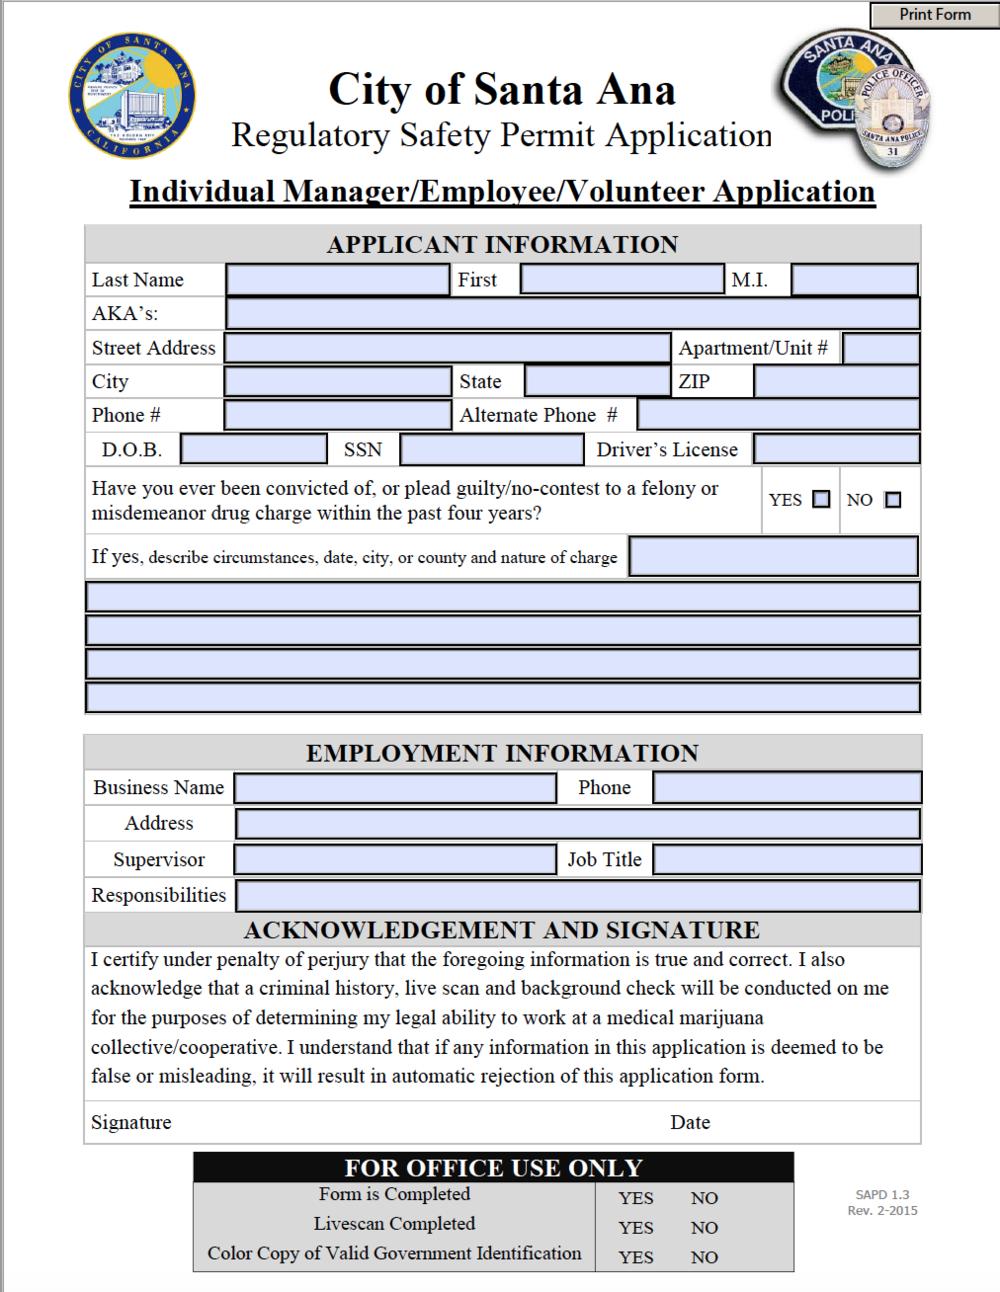 Volunteer Application.png